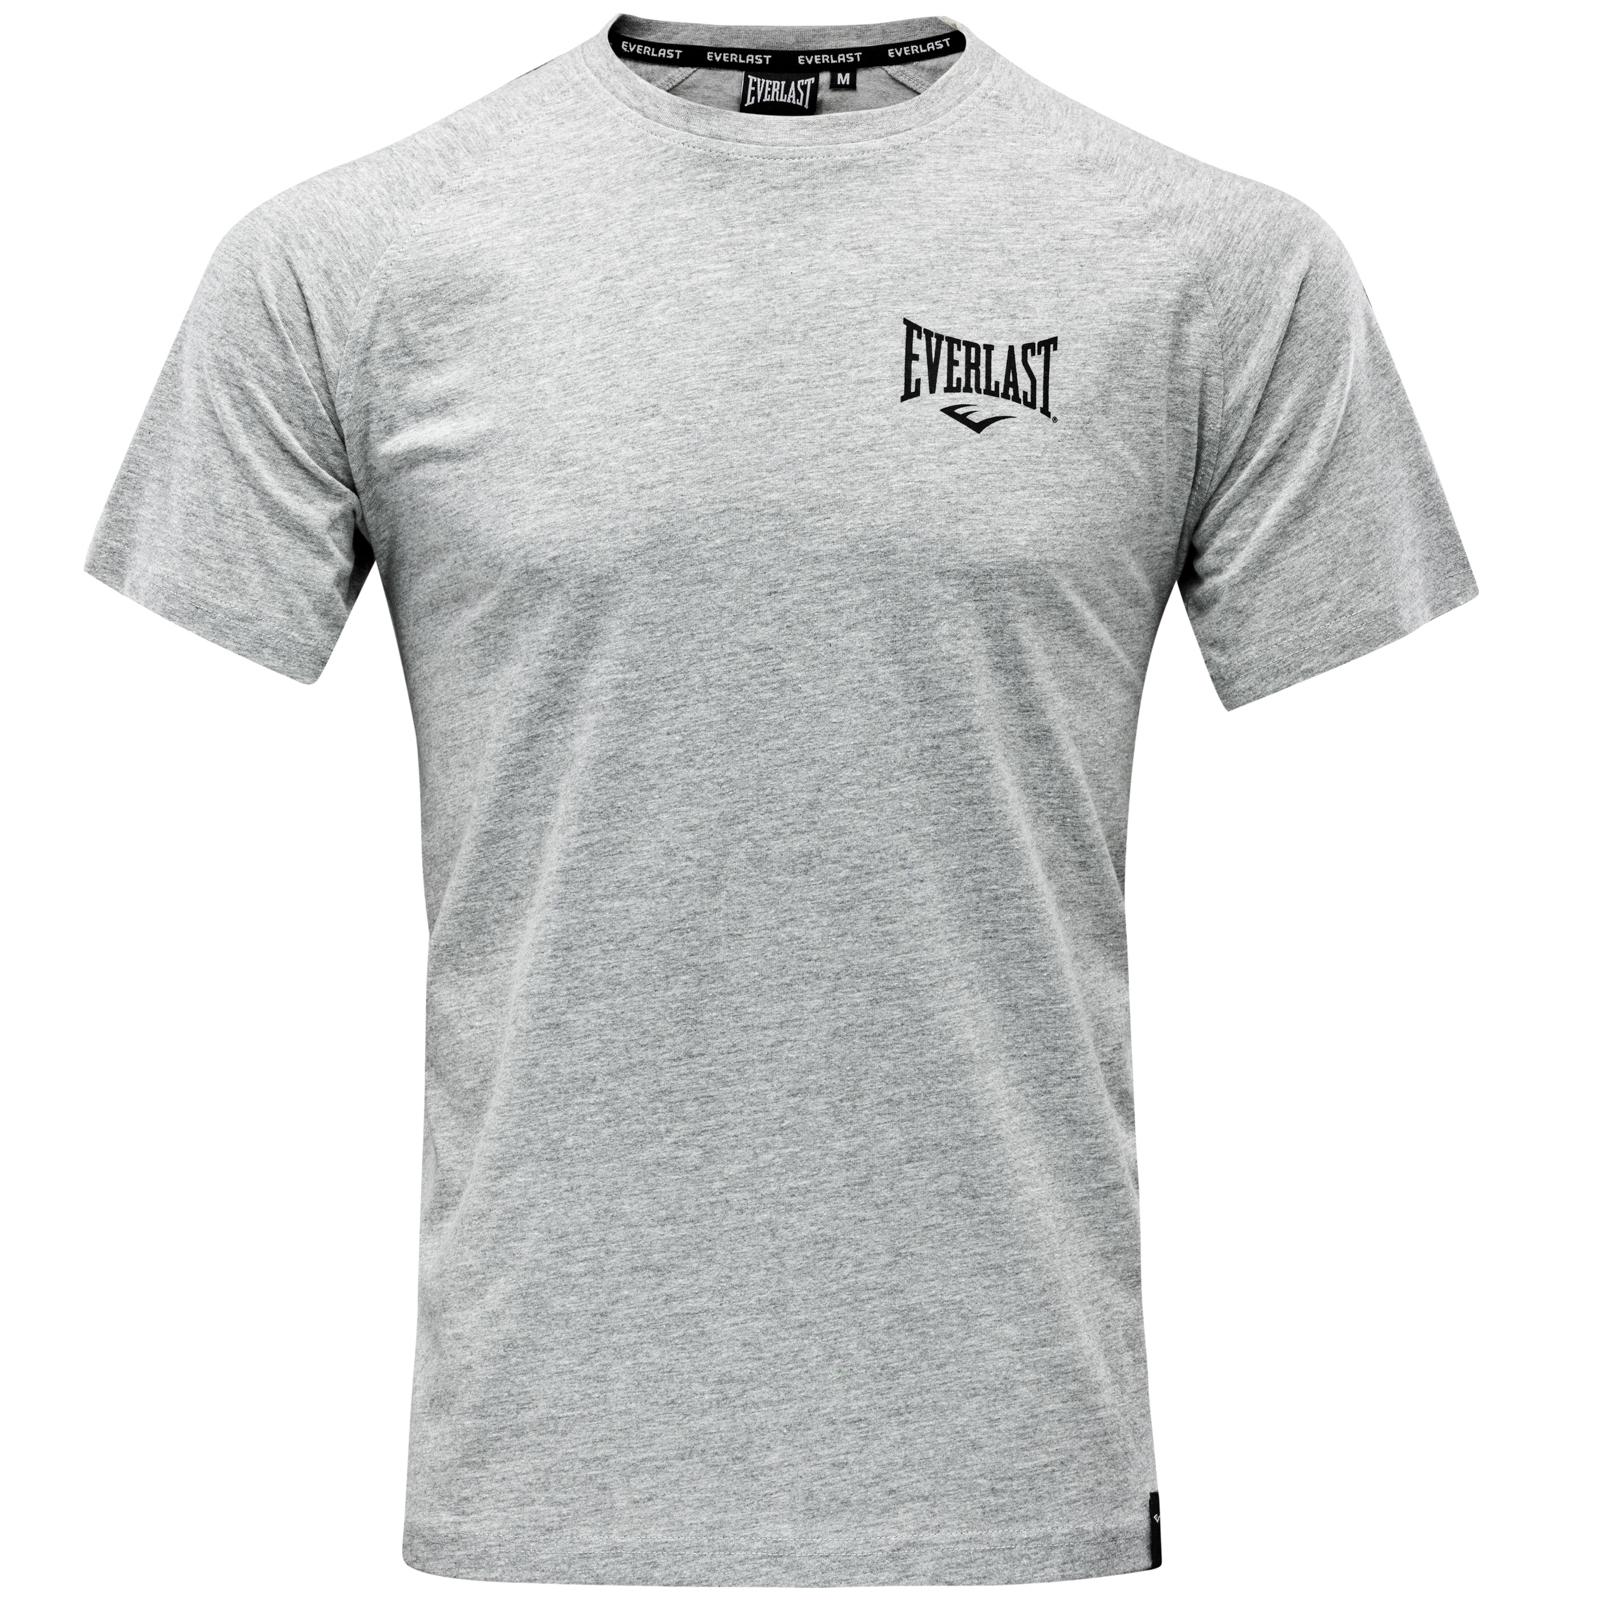 T-shirt Everlast Shawnee Gris